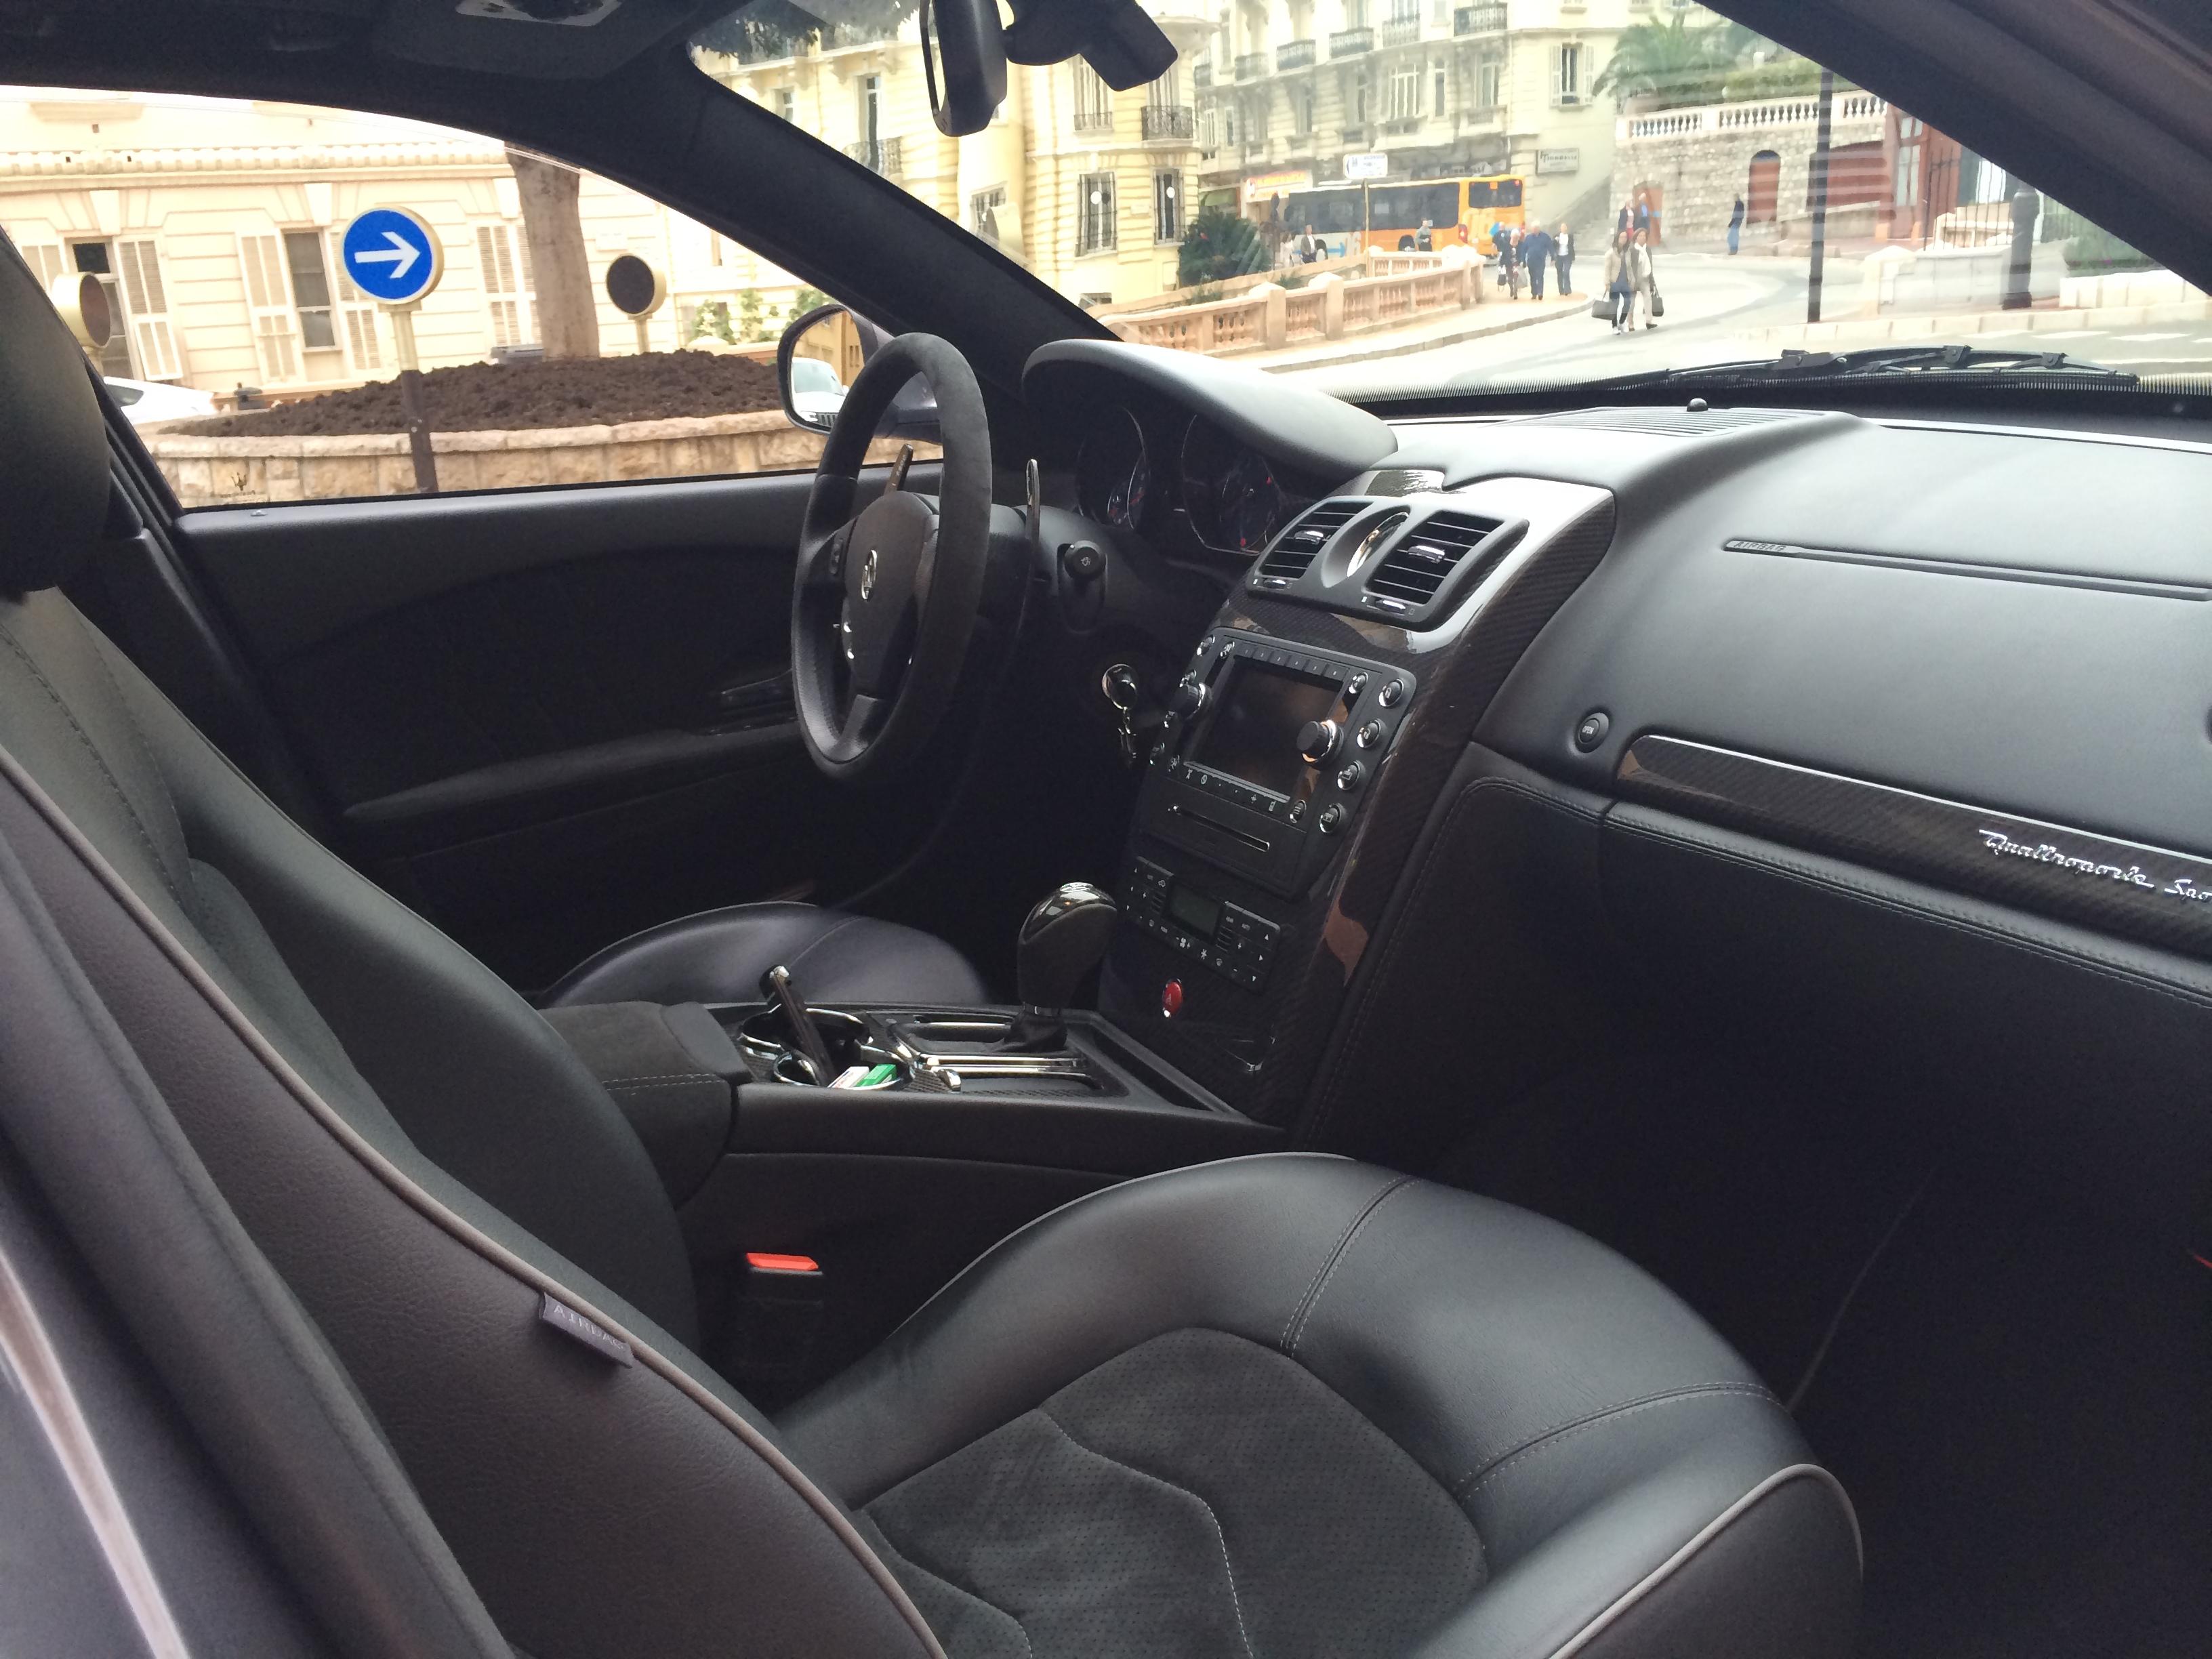 [Vesper] Maserati Quattroporte GTS MC Sportline 1553455809-qp-gts-mc-sport-line-2010-12